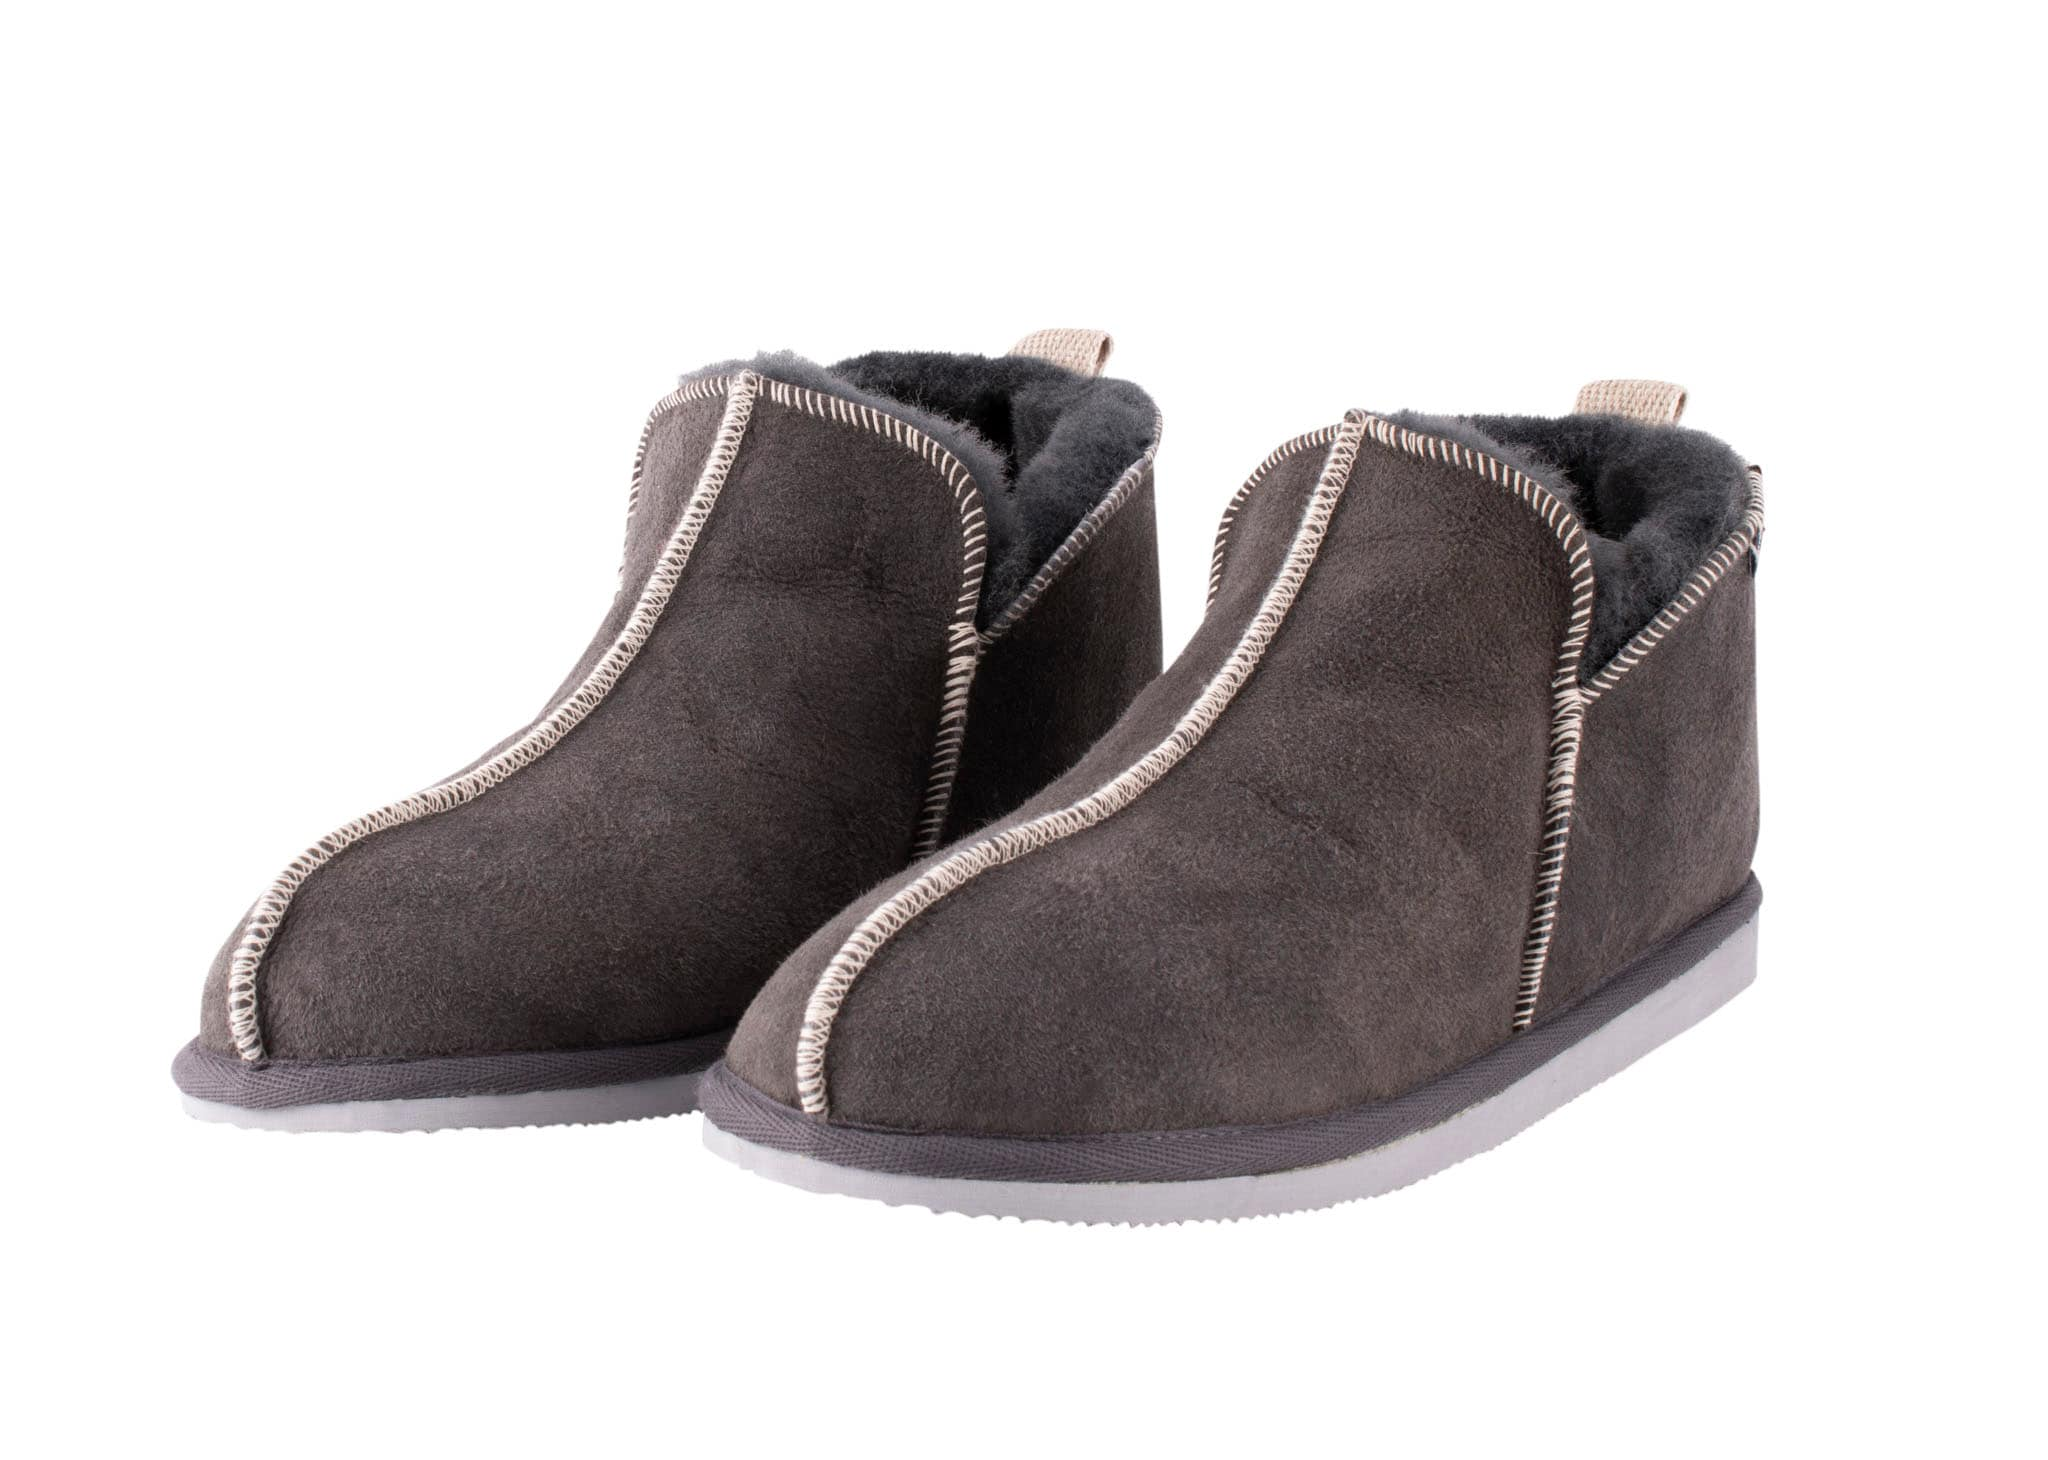 Shepherd Andy slippers